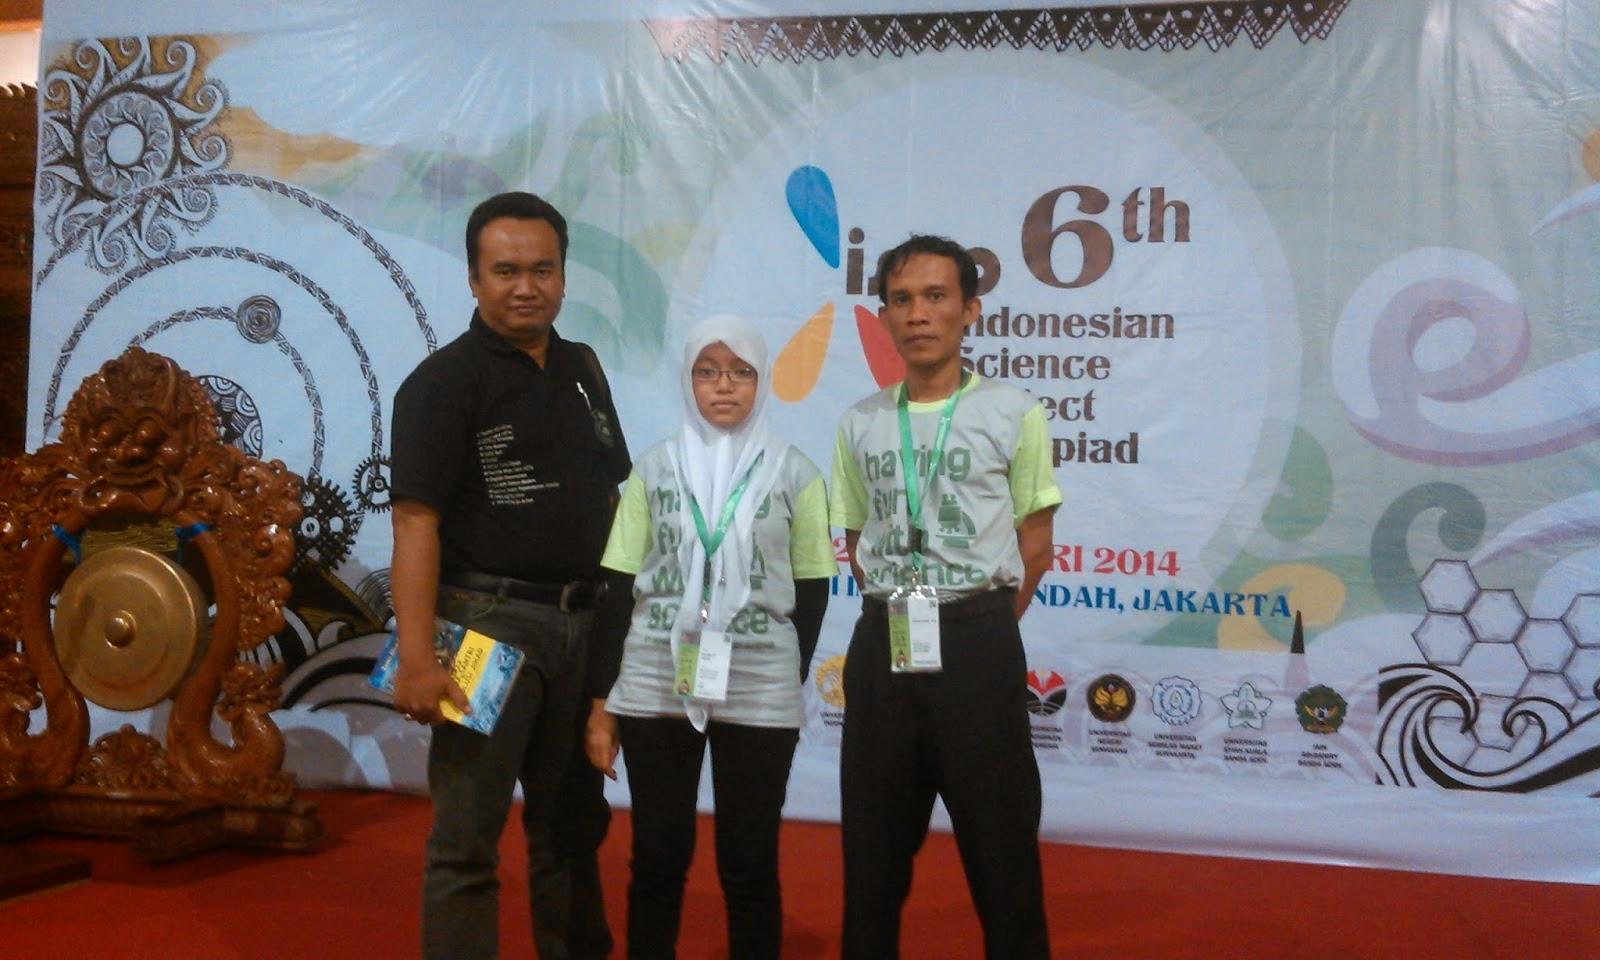 PENGALAMAN MENGIKUTI ISPO (Indonesia Science Project Olimpiad) 2014 di Taman Mini Indonesia Indah JAKARTA